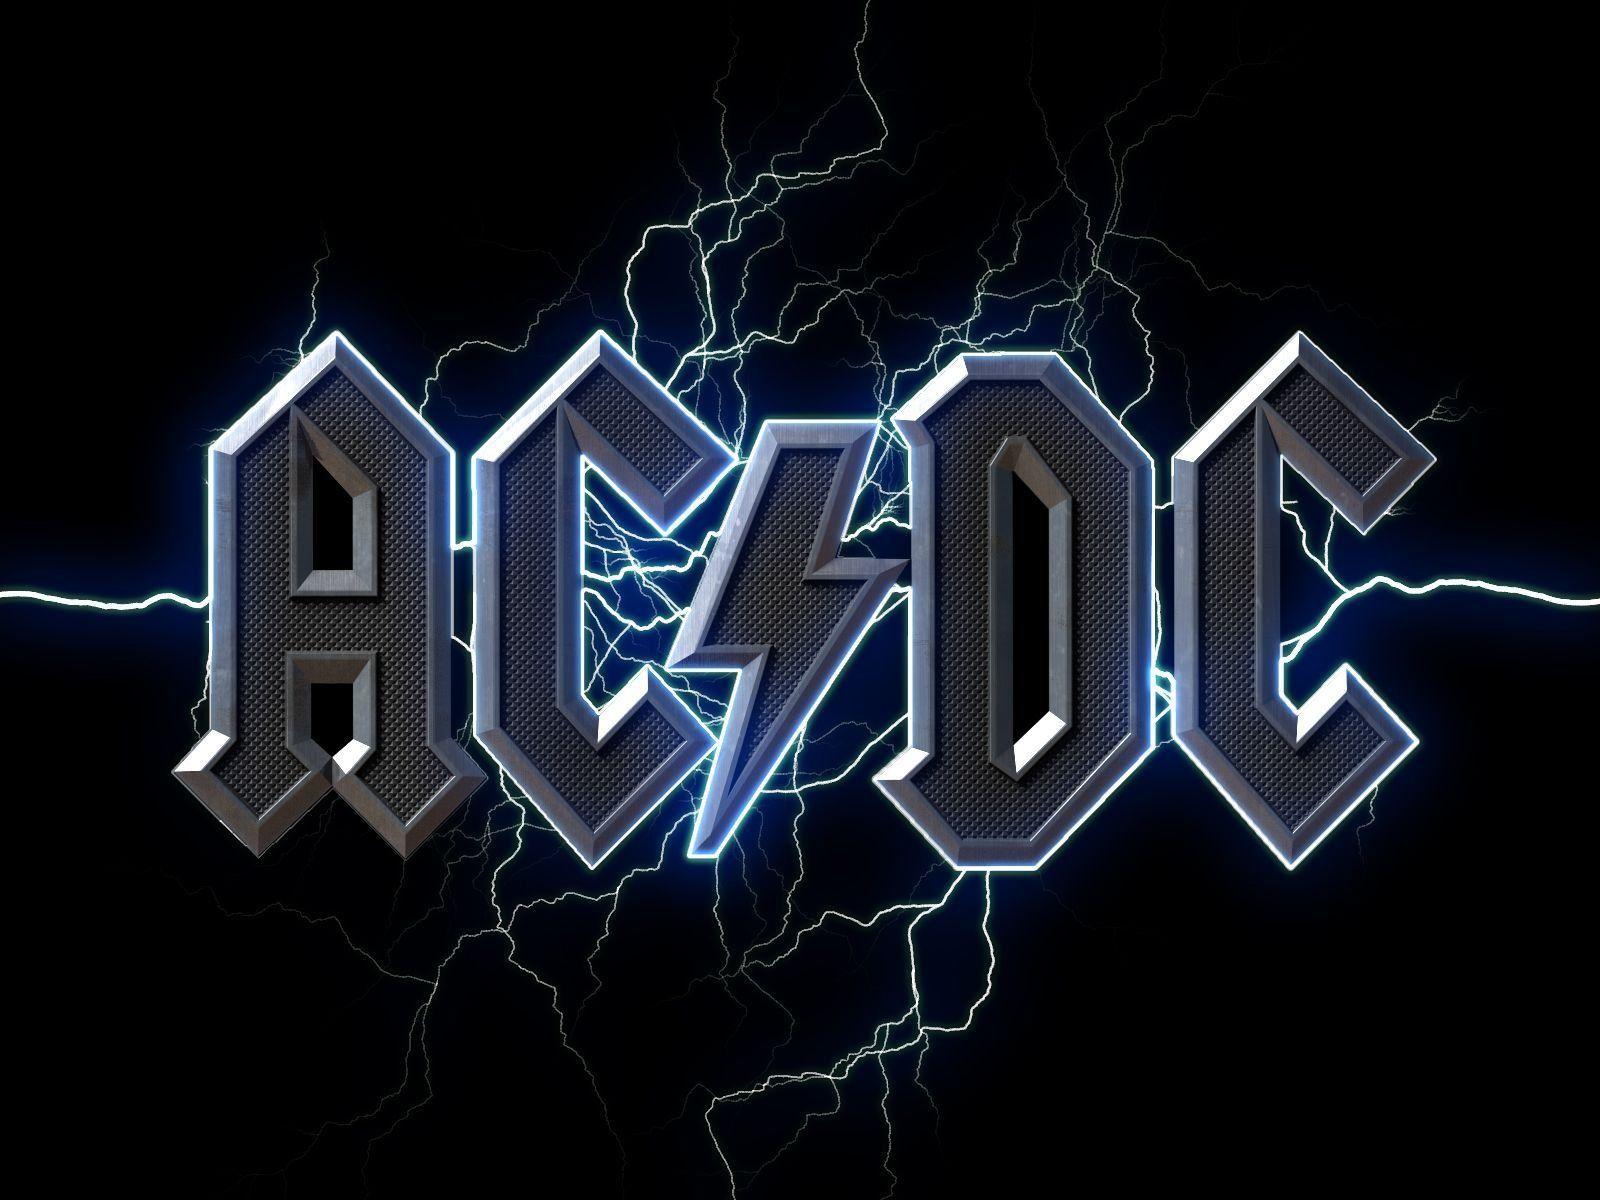 Music AC/DC  Wallpaper